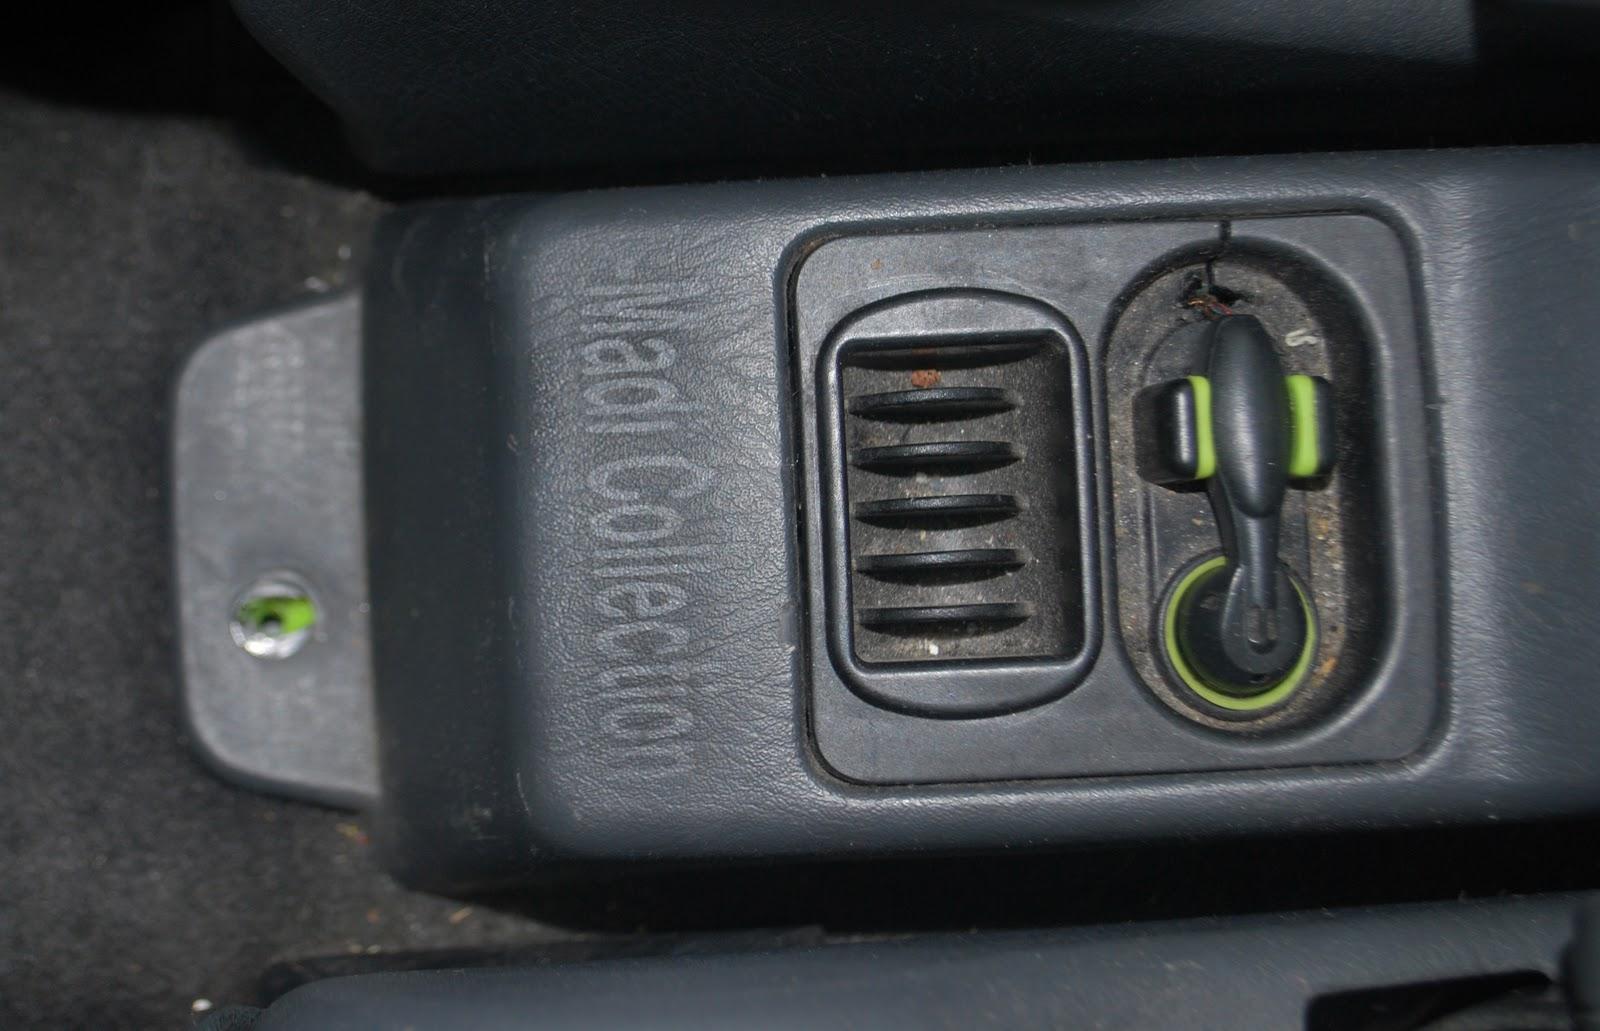 Myvi Fuse Box Diagram Alarm Wiring Jzgreentown Proton Saga Blm Perodua Kancil Malaysia Car Creativeand